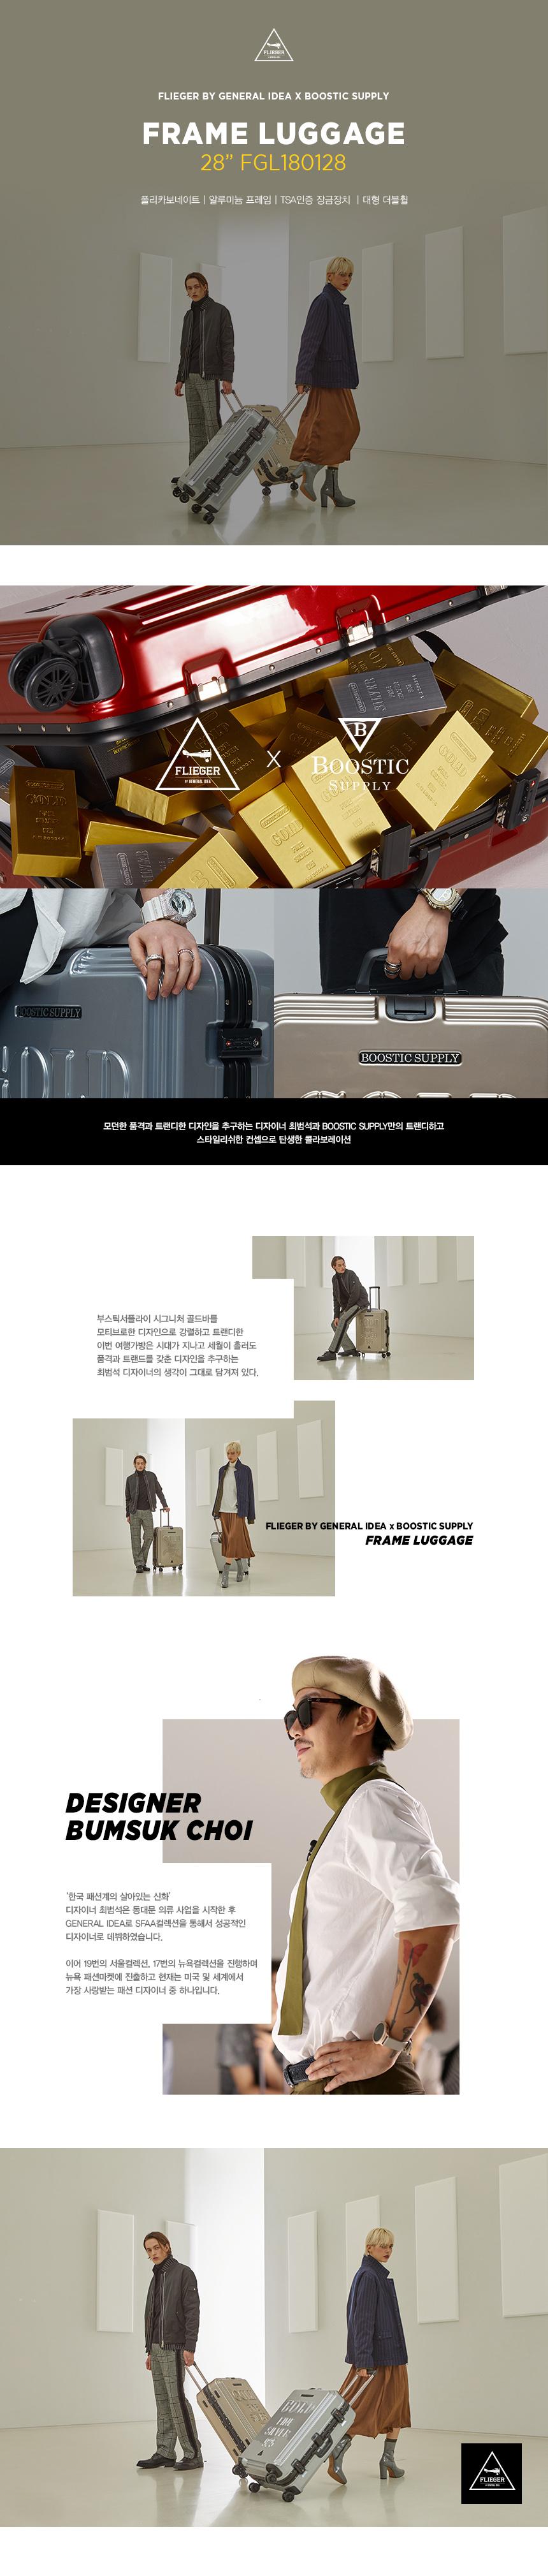 01_intro_brand.jpg